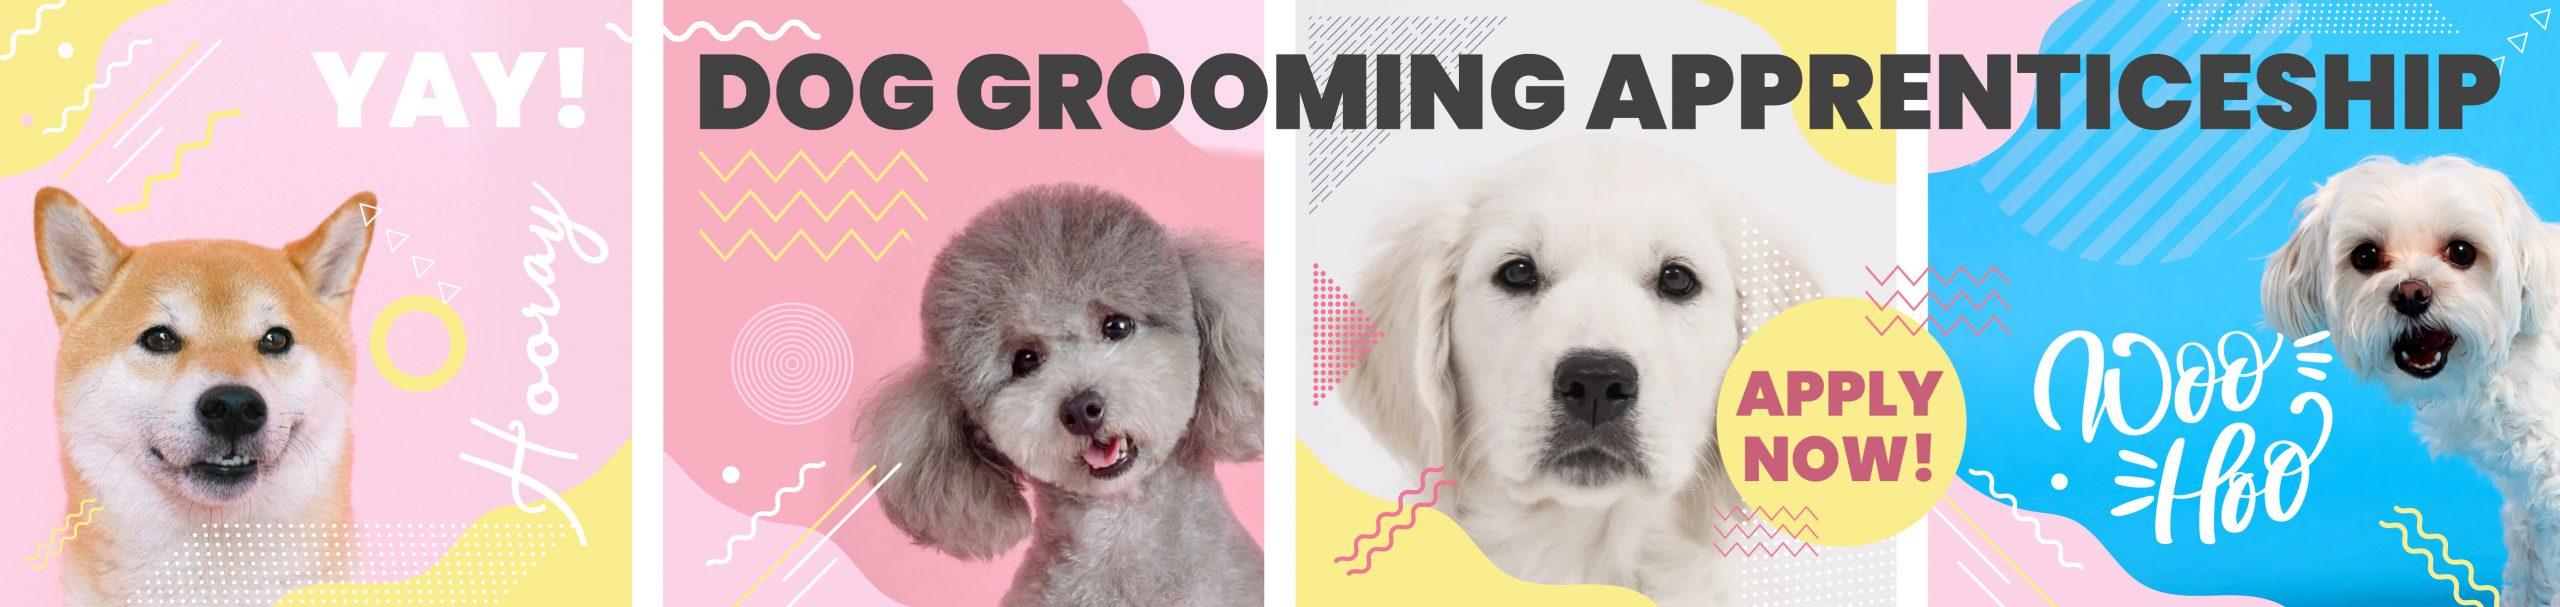 Course: Dog Groomer Level 2 Apprenticeship